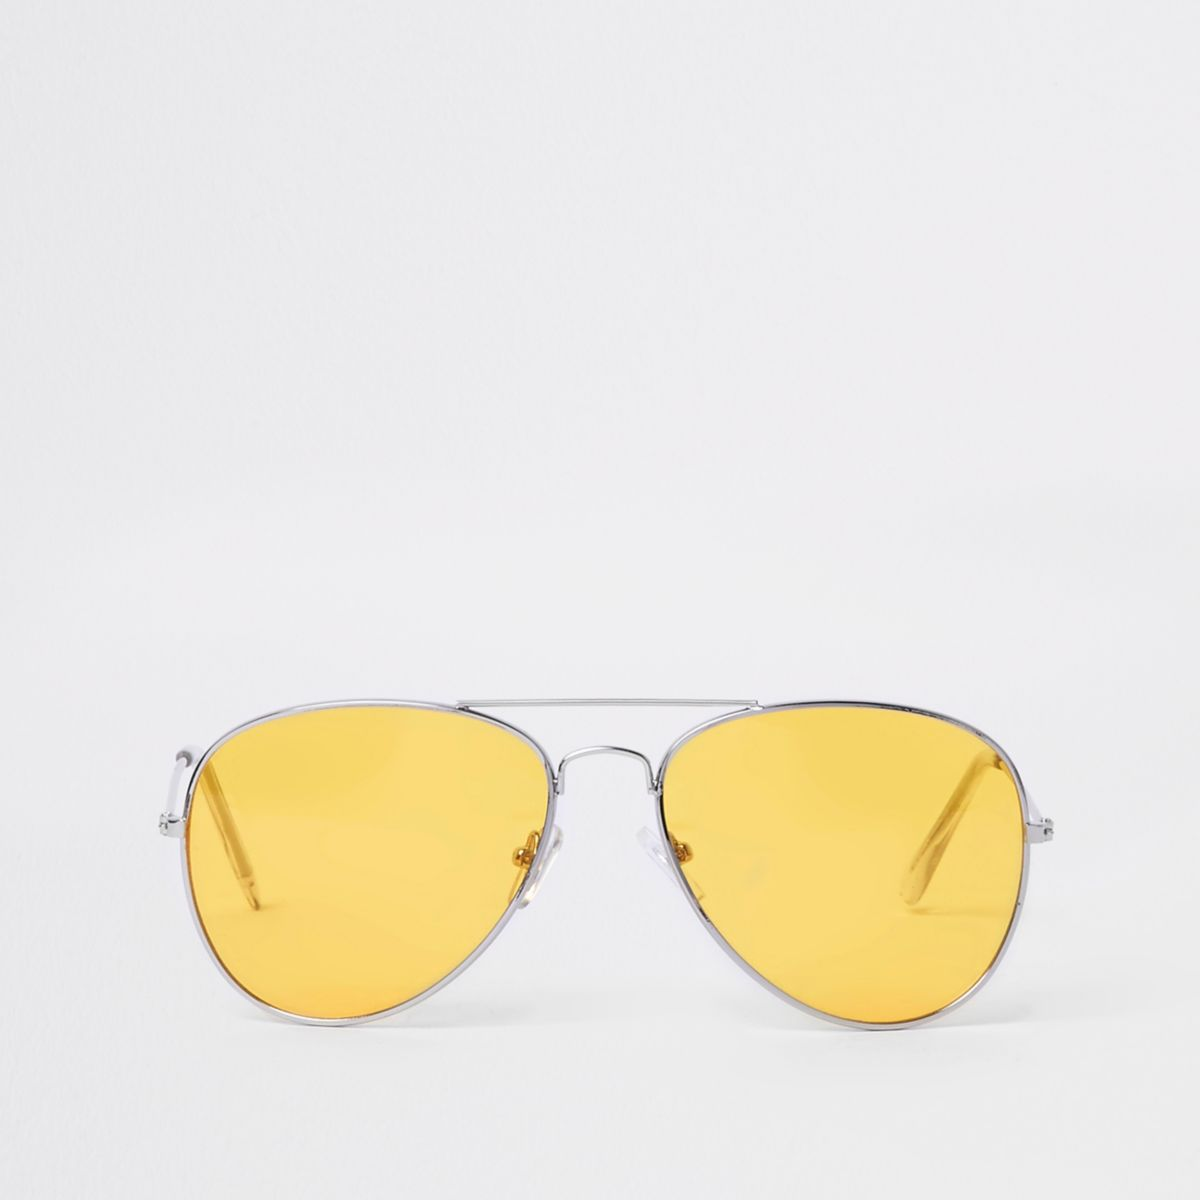 Silver yellow lens aviator sunglasses